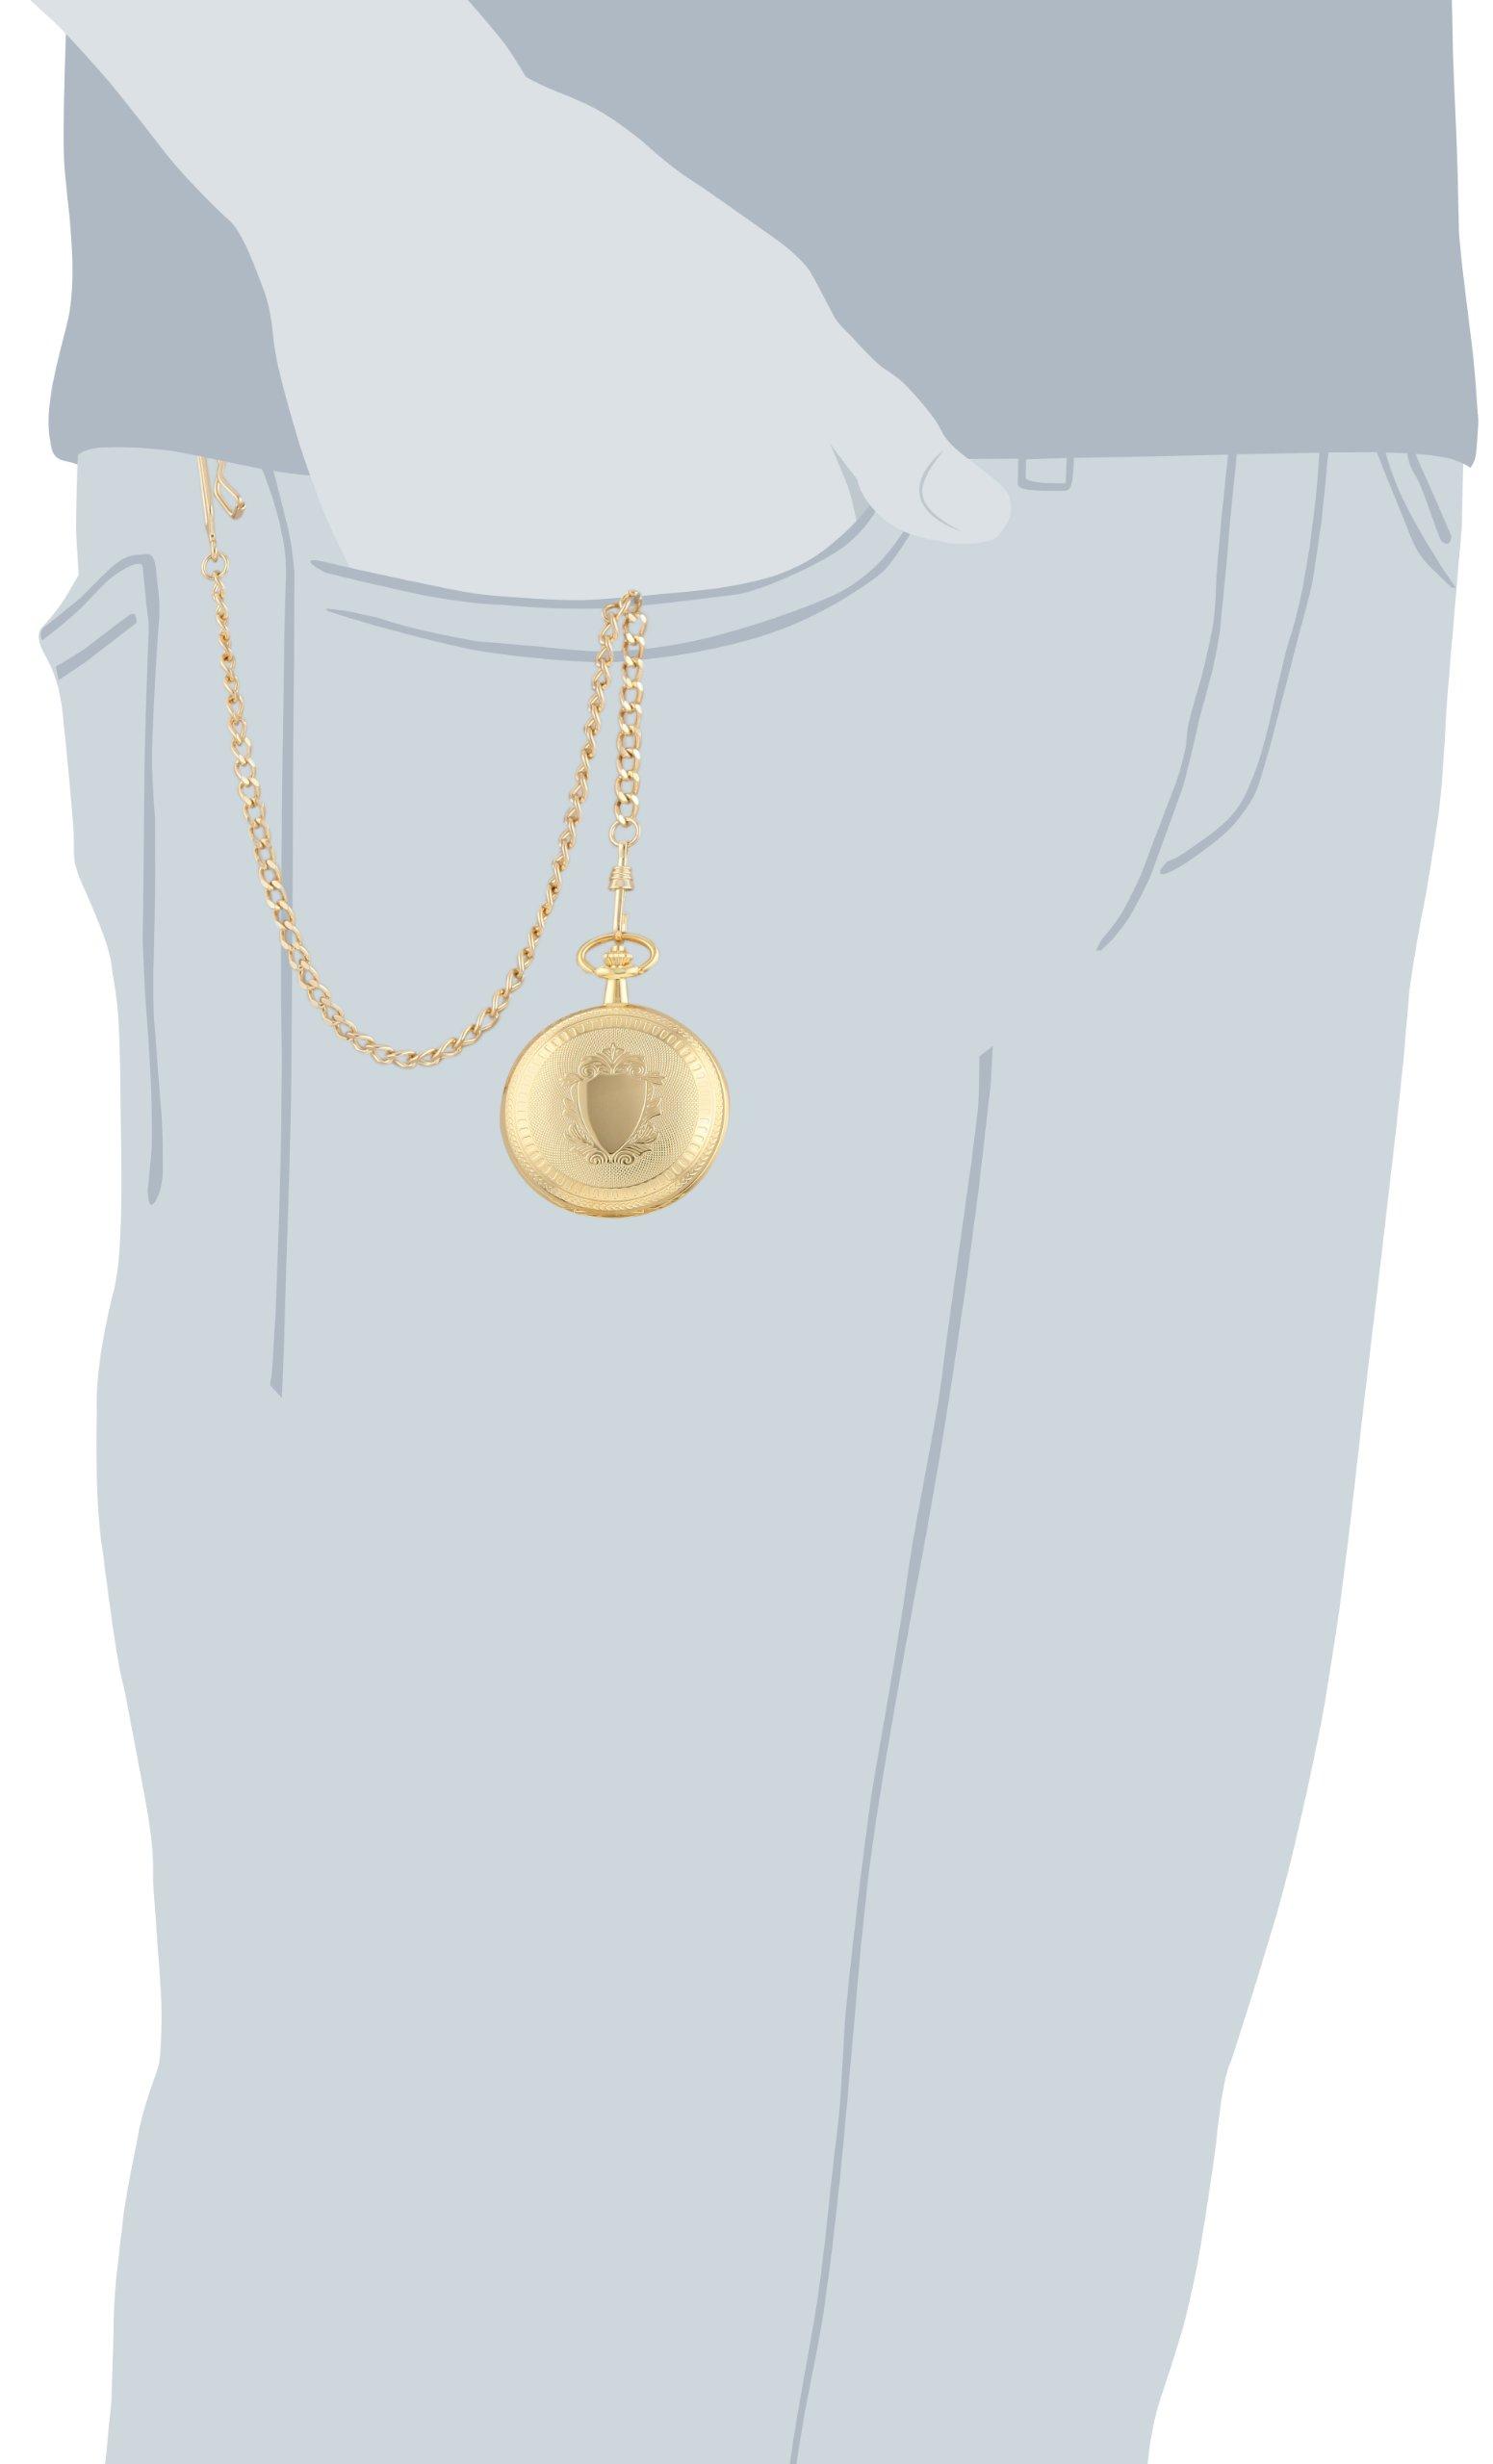 Charles-Hubert, Paris 3556 Gold-Plated Mechanical Pocket Watch by CHARLES-HUBERT PARIS (Image #4)